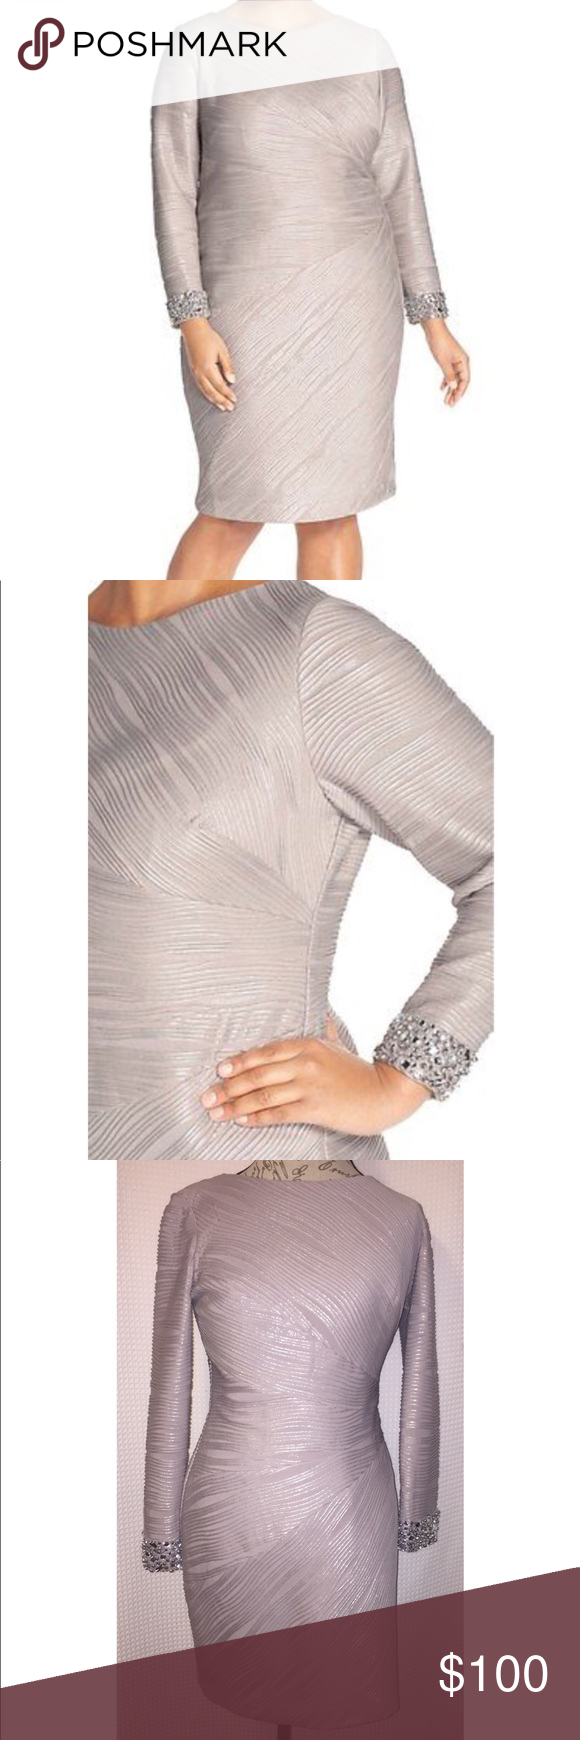 Eliza j classy embellished dress